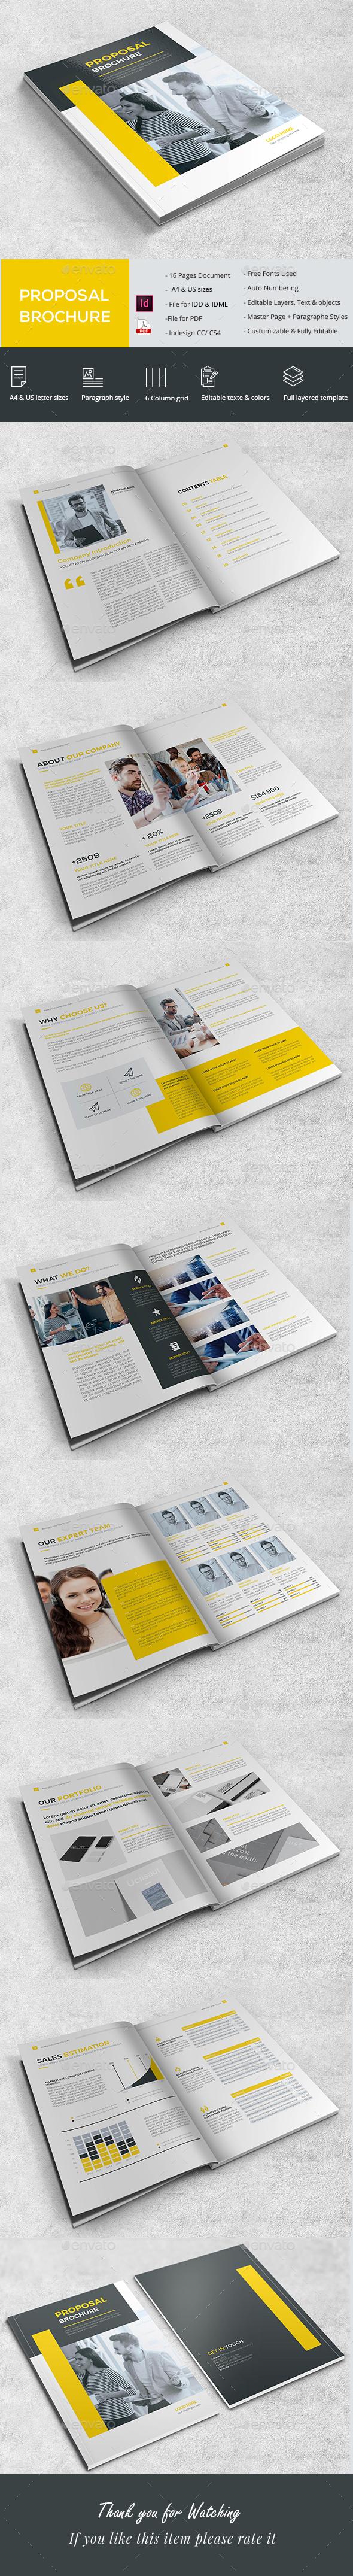 Simple Proposal Brochure - Brochures Print Templates